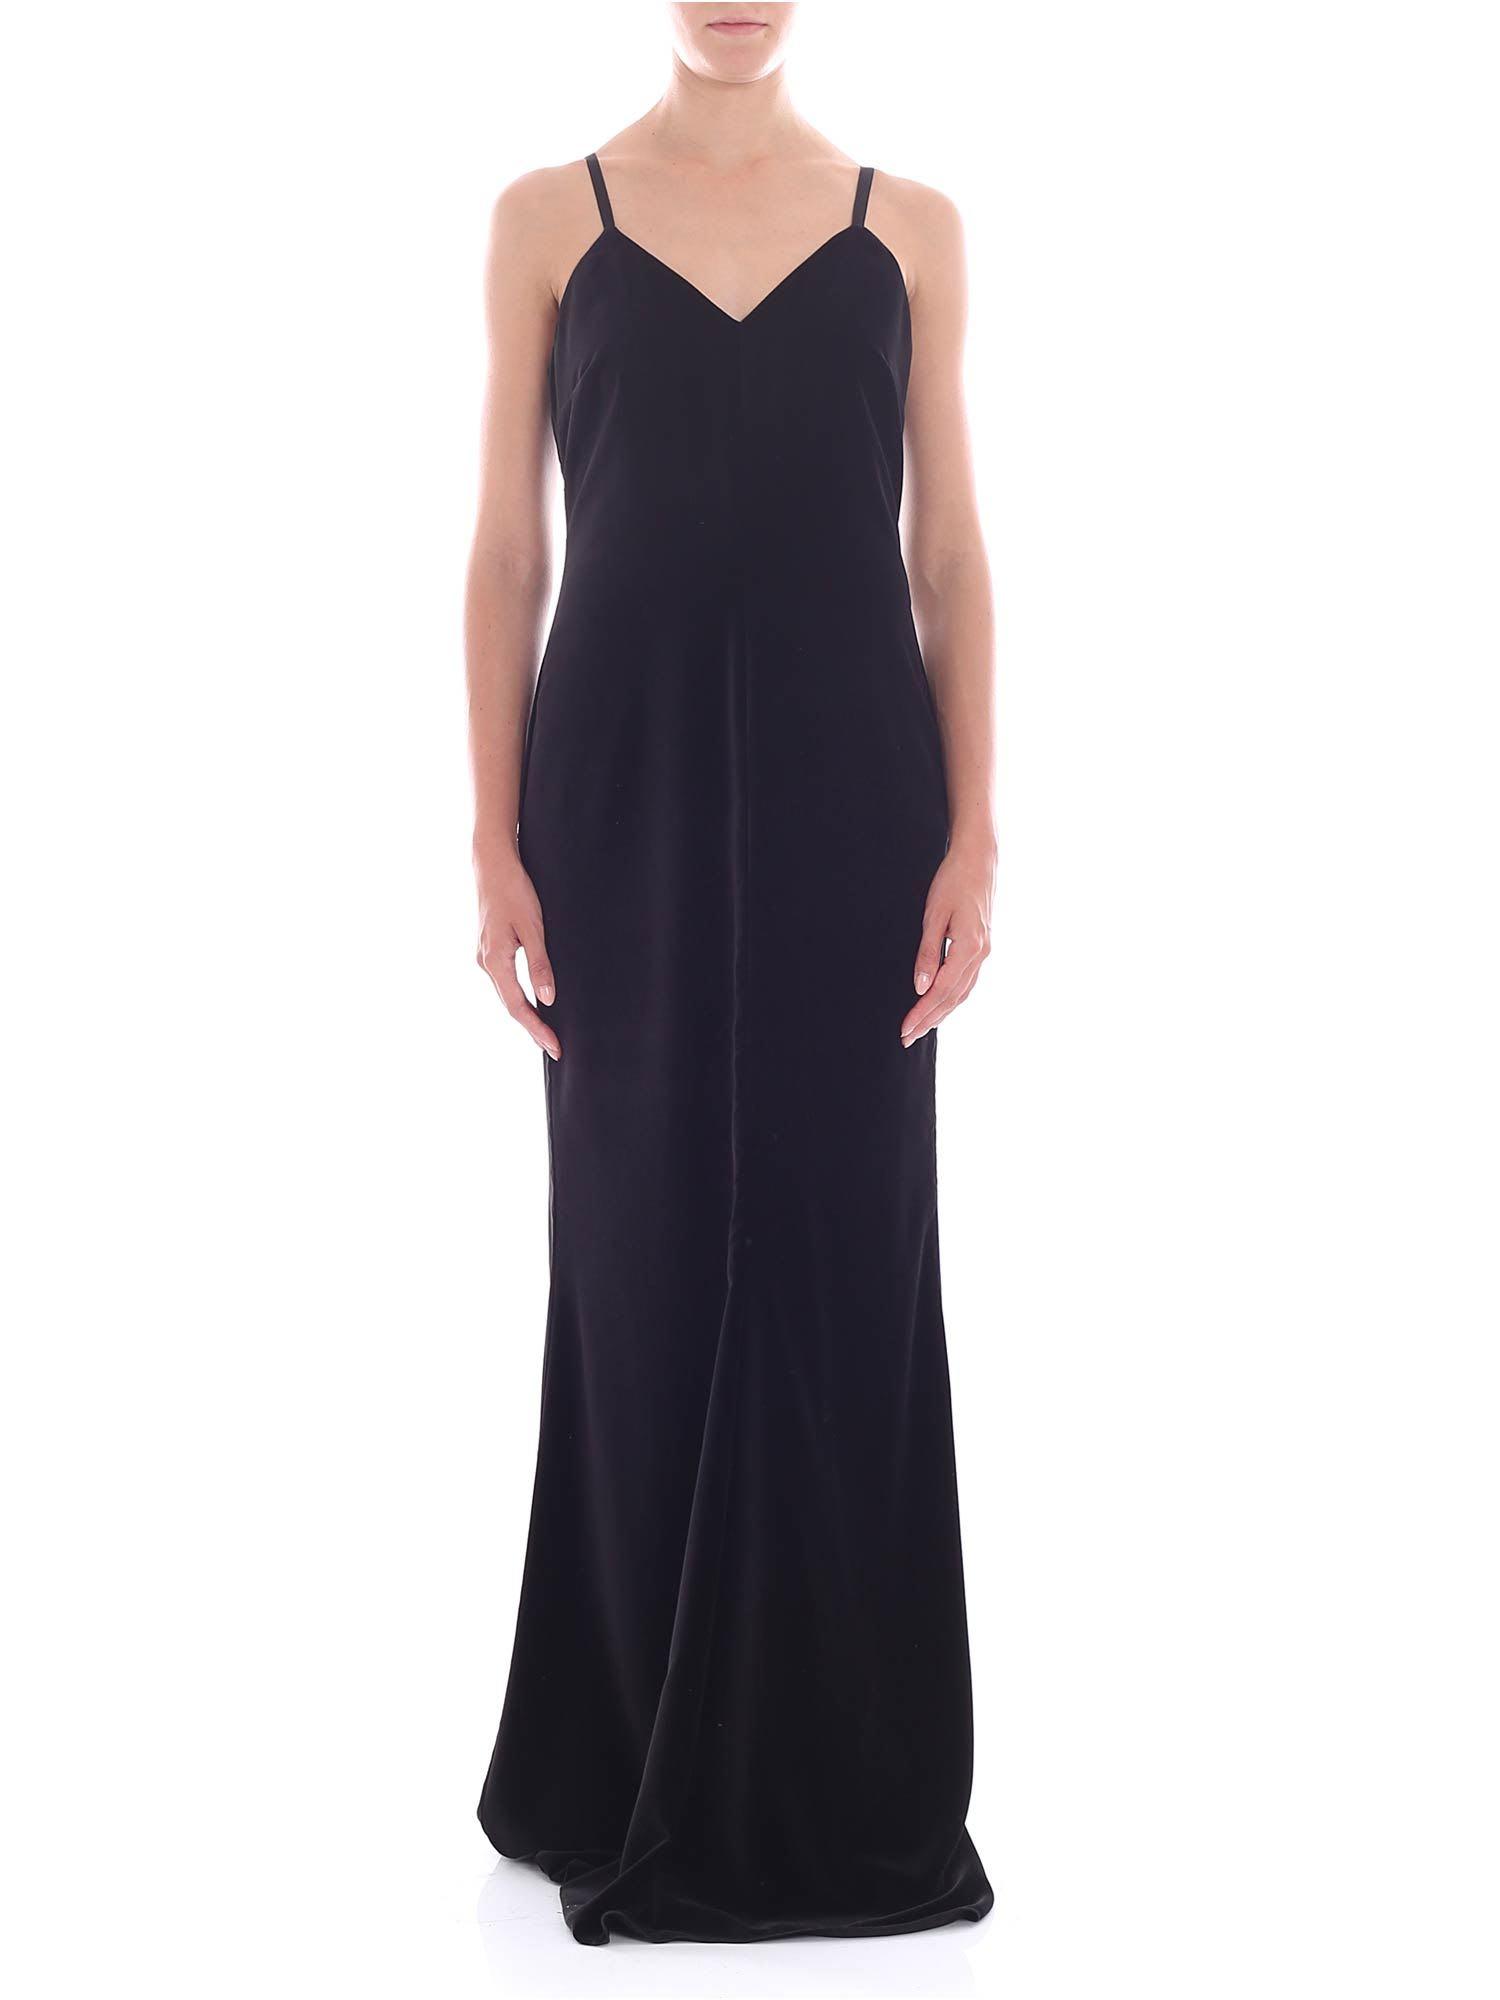 Max Mara - Caladio Dress